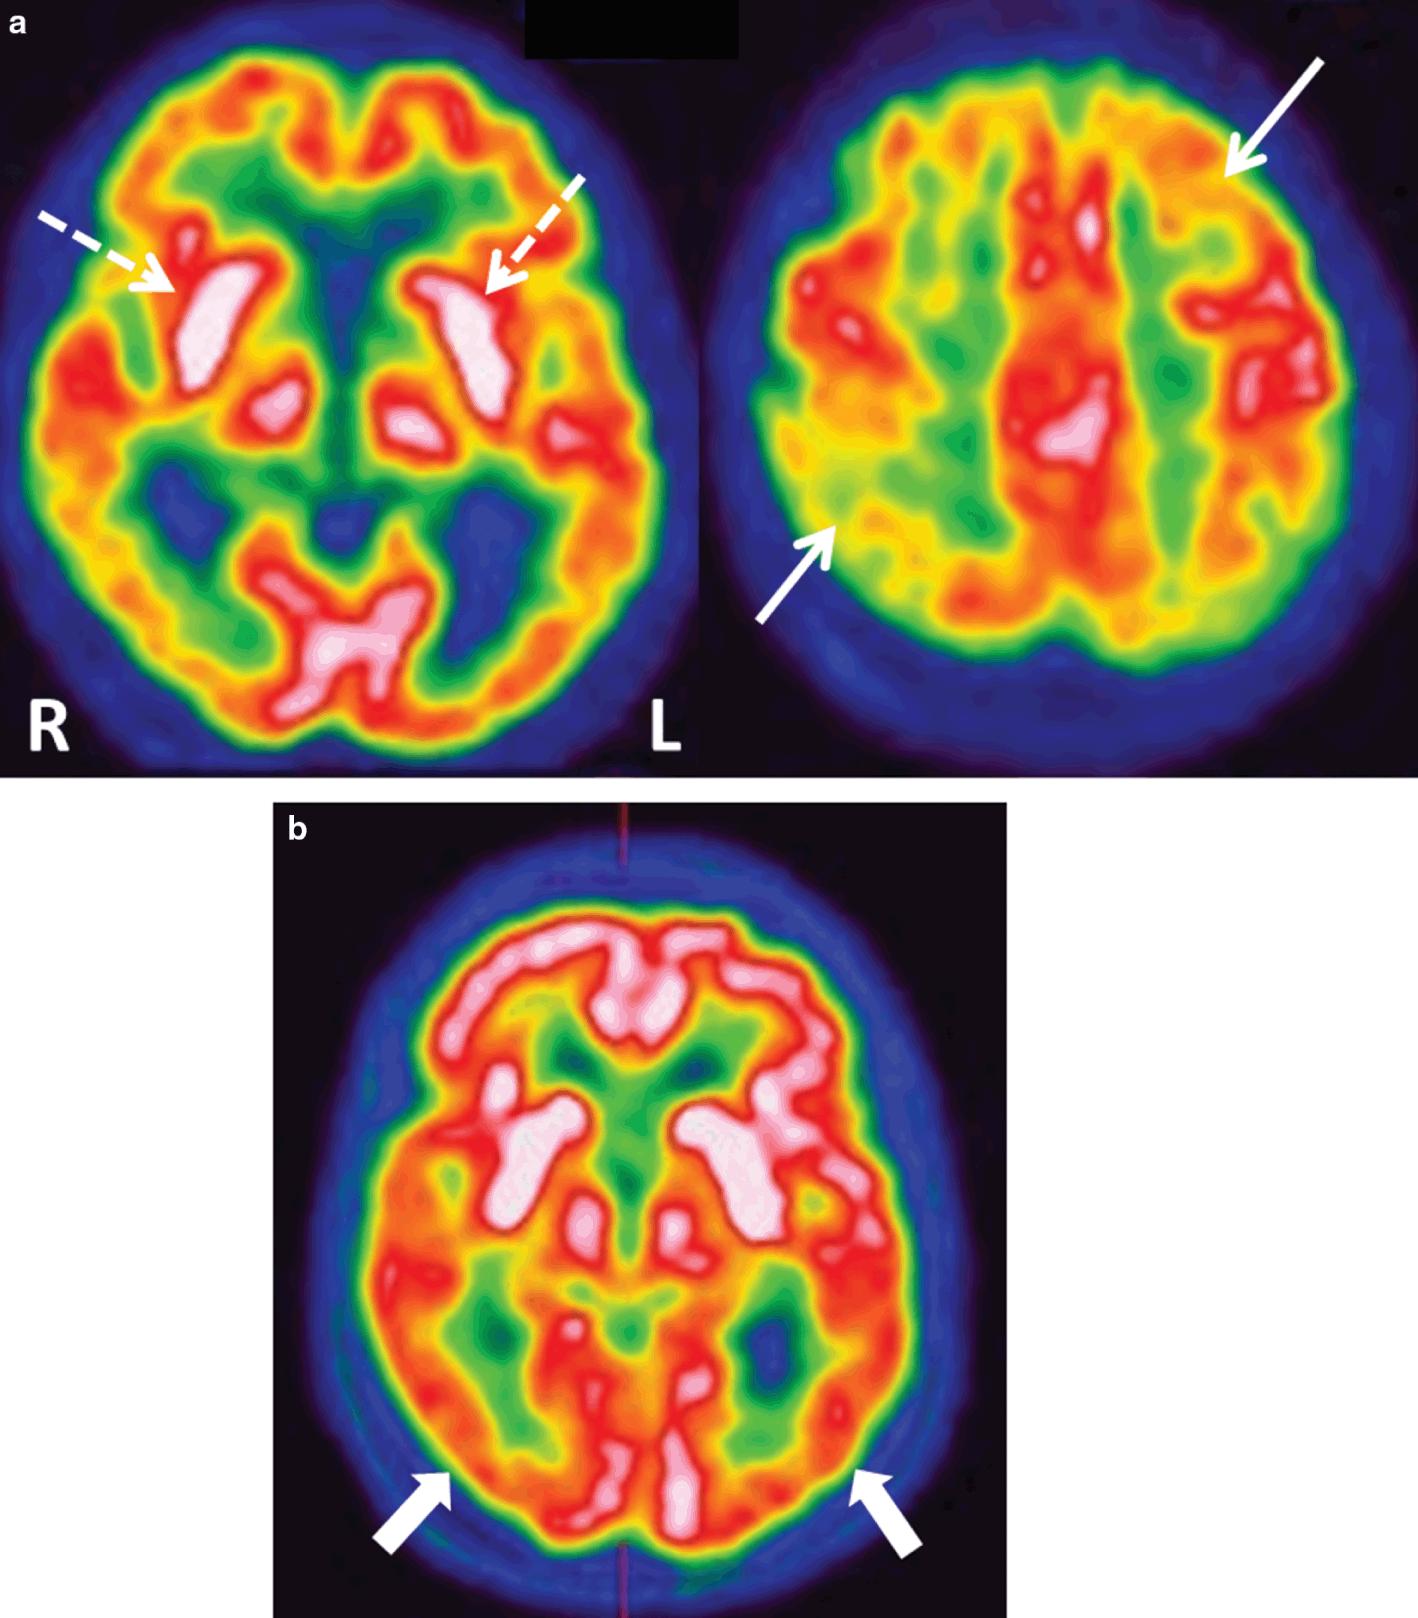 Parkinsonism (Chapter 17) - Imaging Acute Neurologic Disease